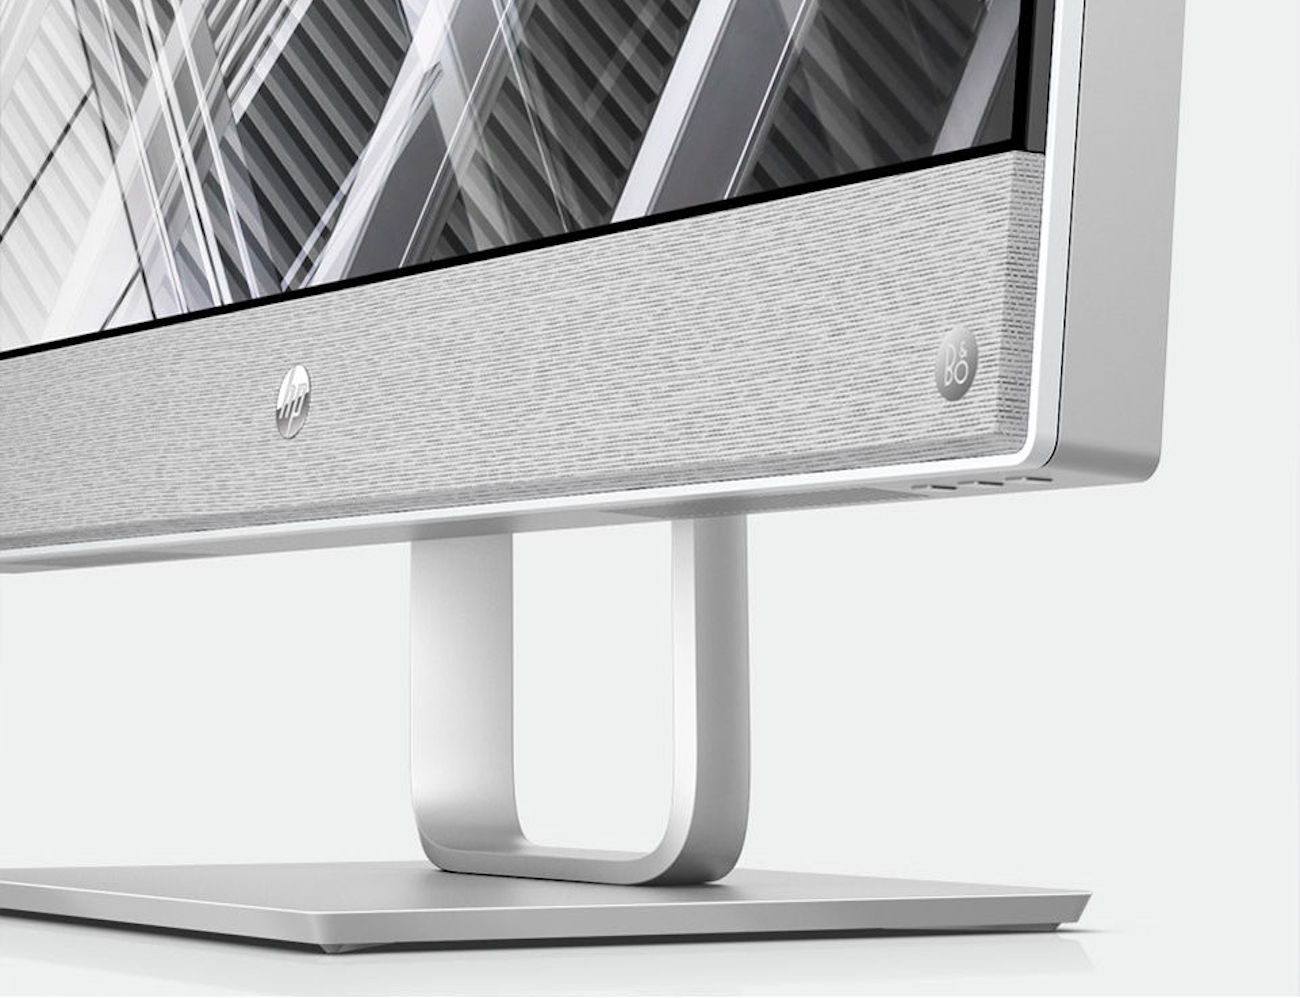 HP Pavilion All-in-One Desktop Computer